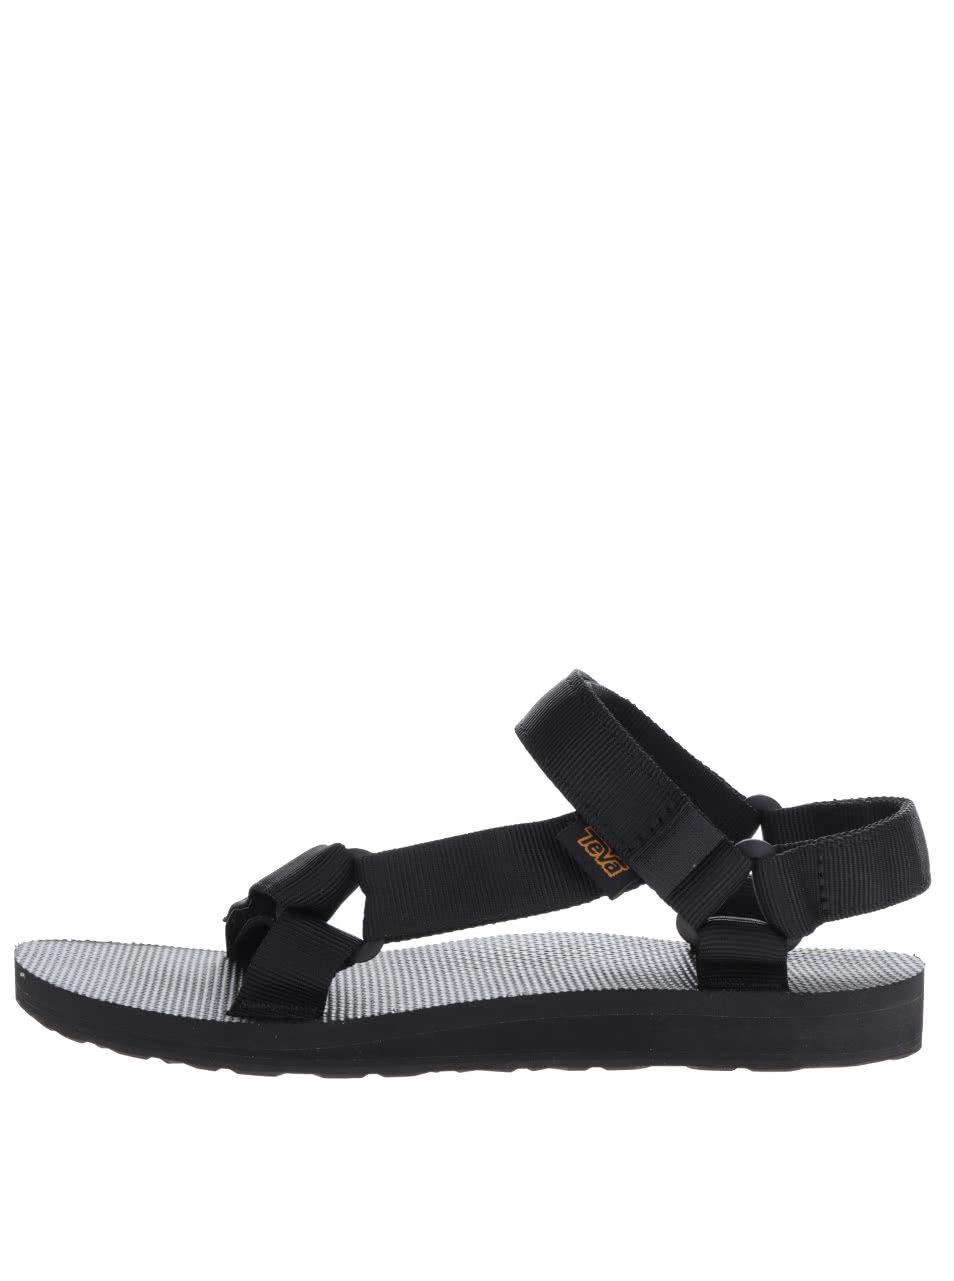 9e1447943d96 Čierne dámske sandále Teva ...